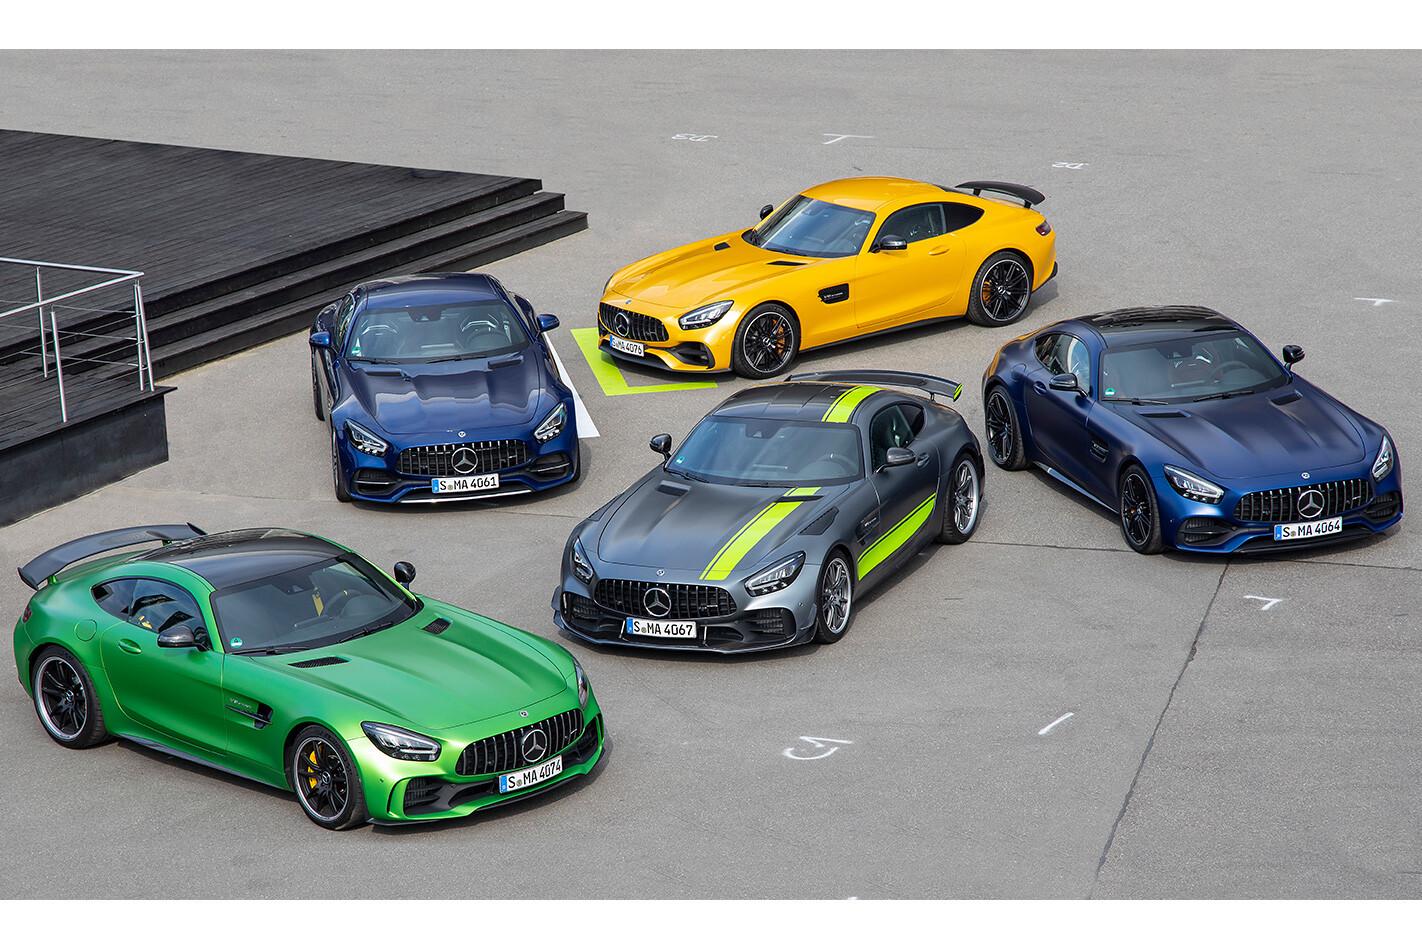 Mercedes Amg Gt Group Jpg